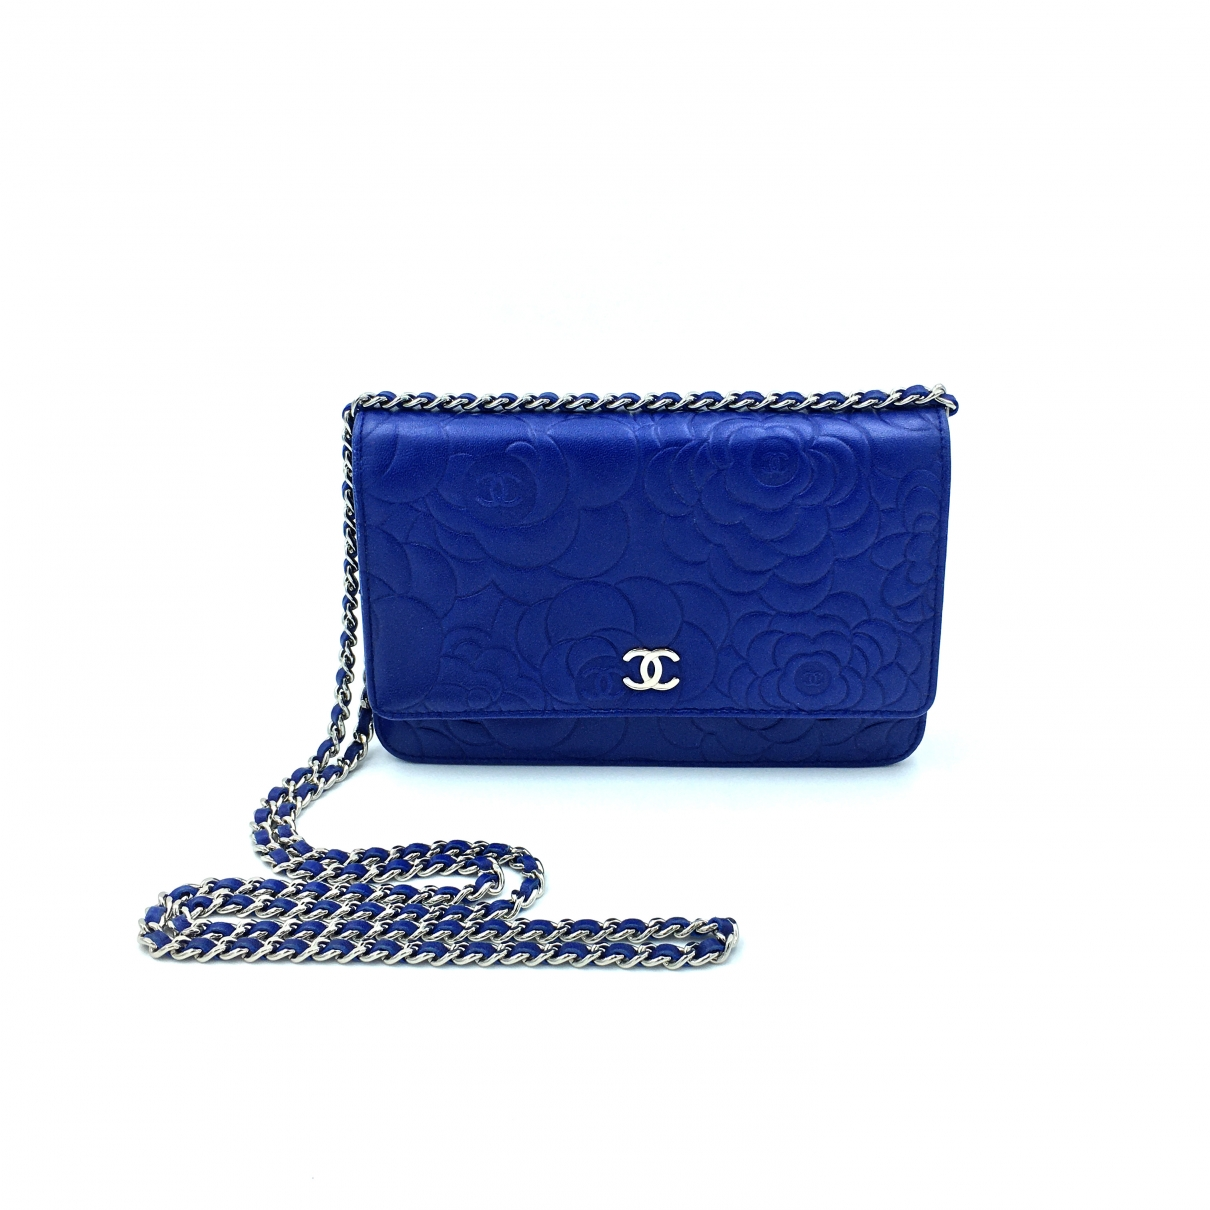 Chanel - Sac a main Wallet on Chain pour femme en cuir - bleu